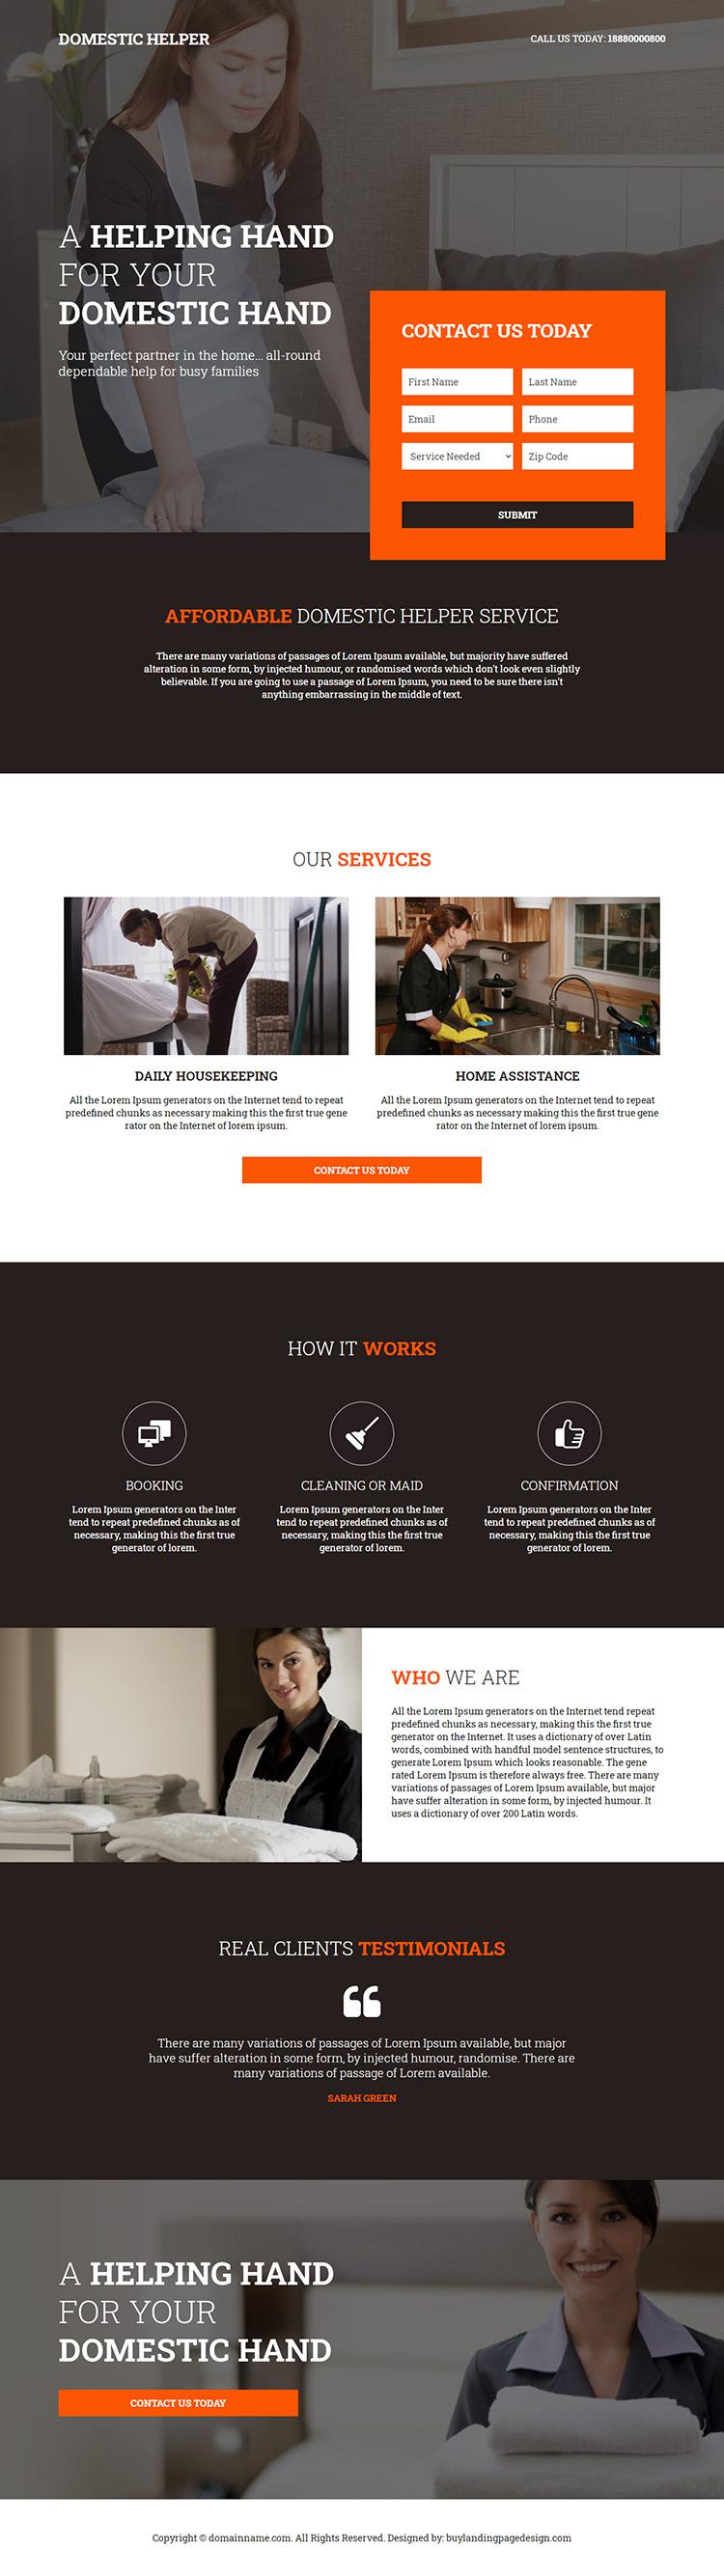 reliable domestic helper service responsive landing page design